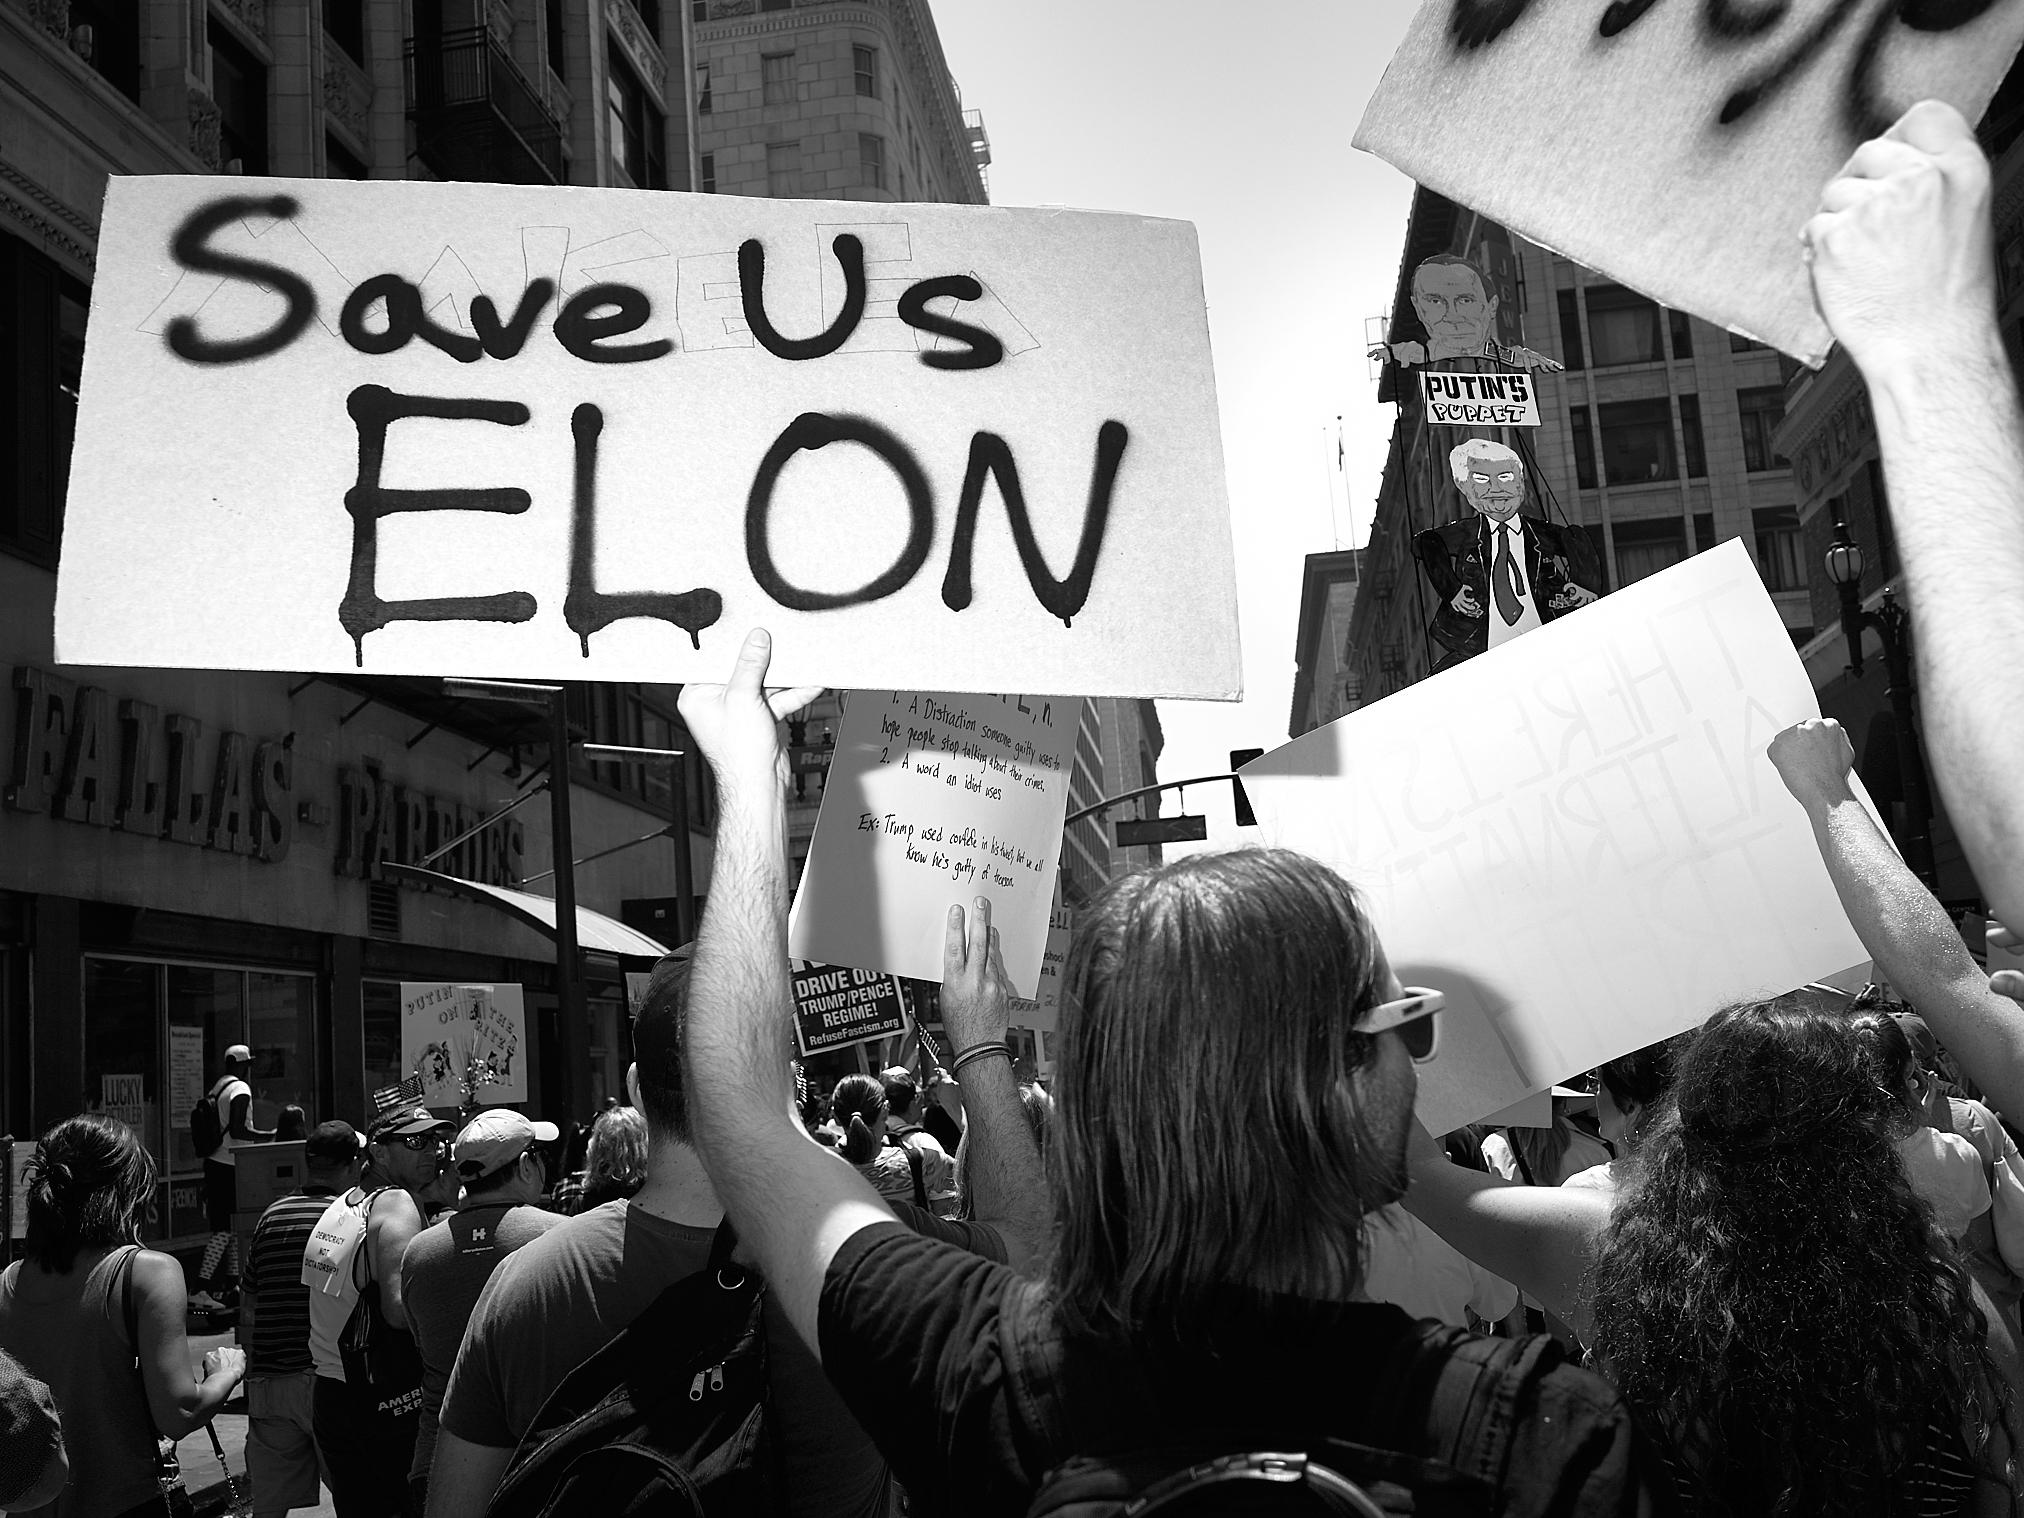 Save us Elon by Peter Adams.